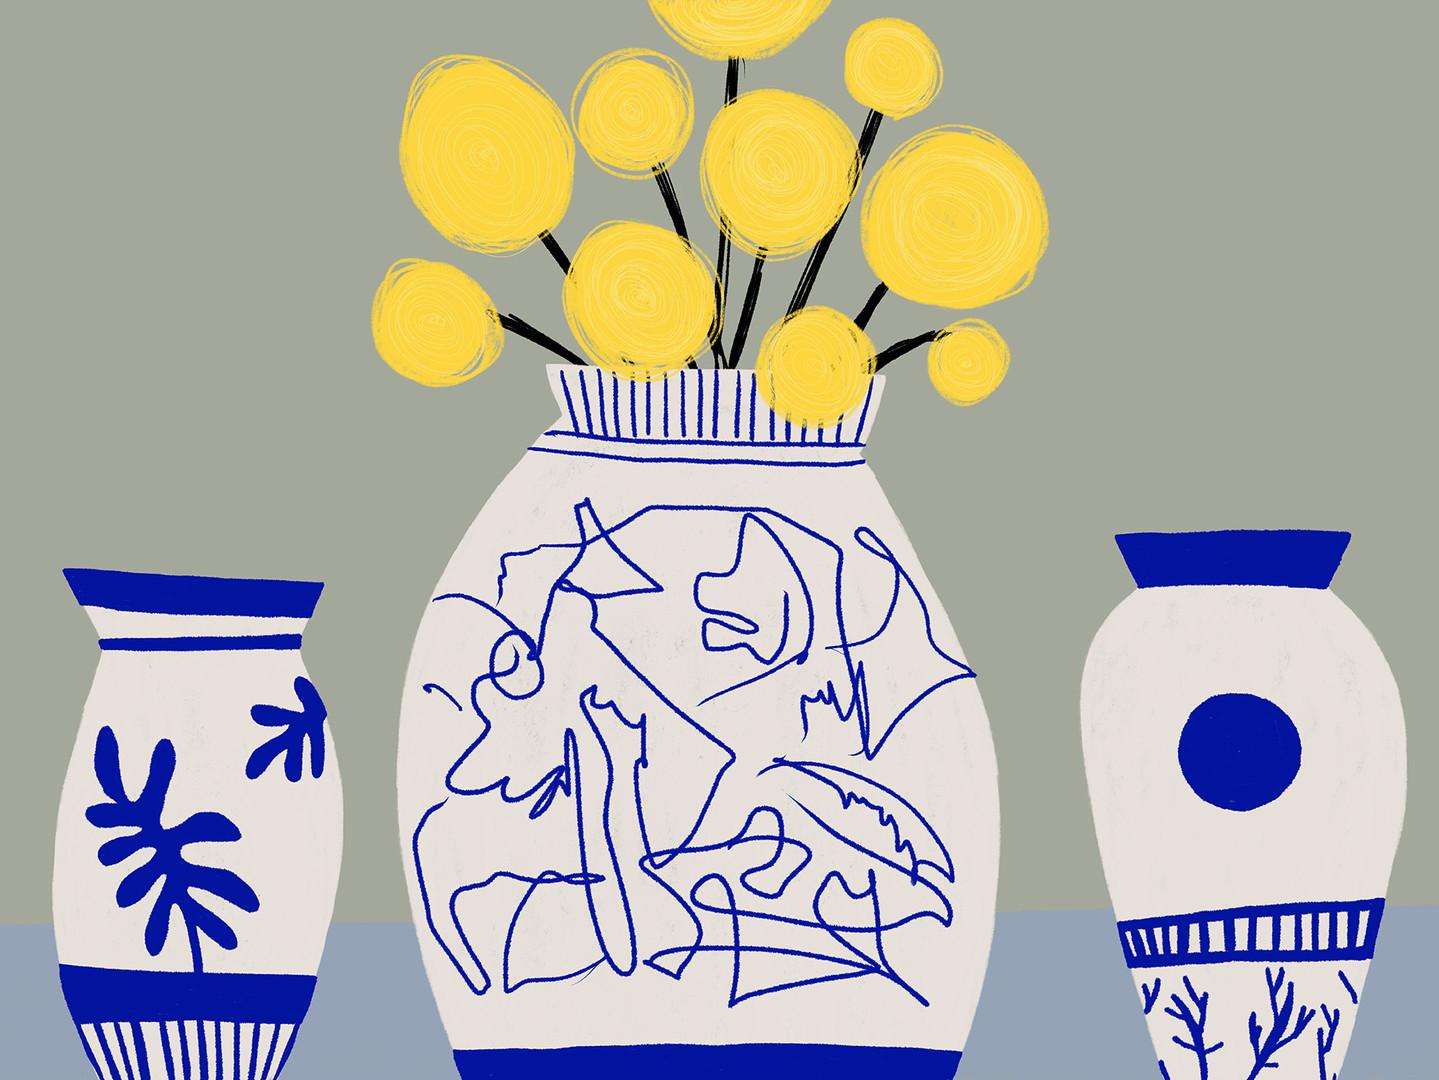 Натюрморт с китайскими вазами